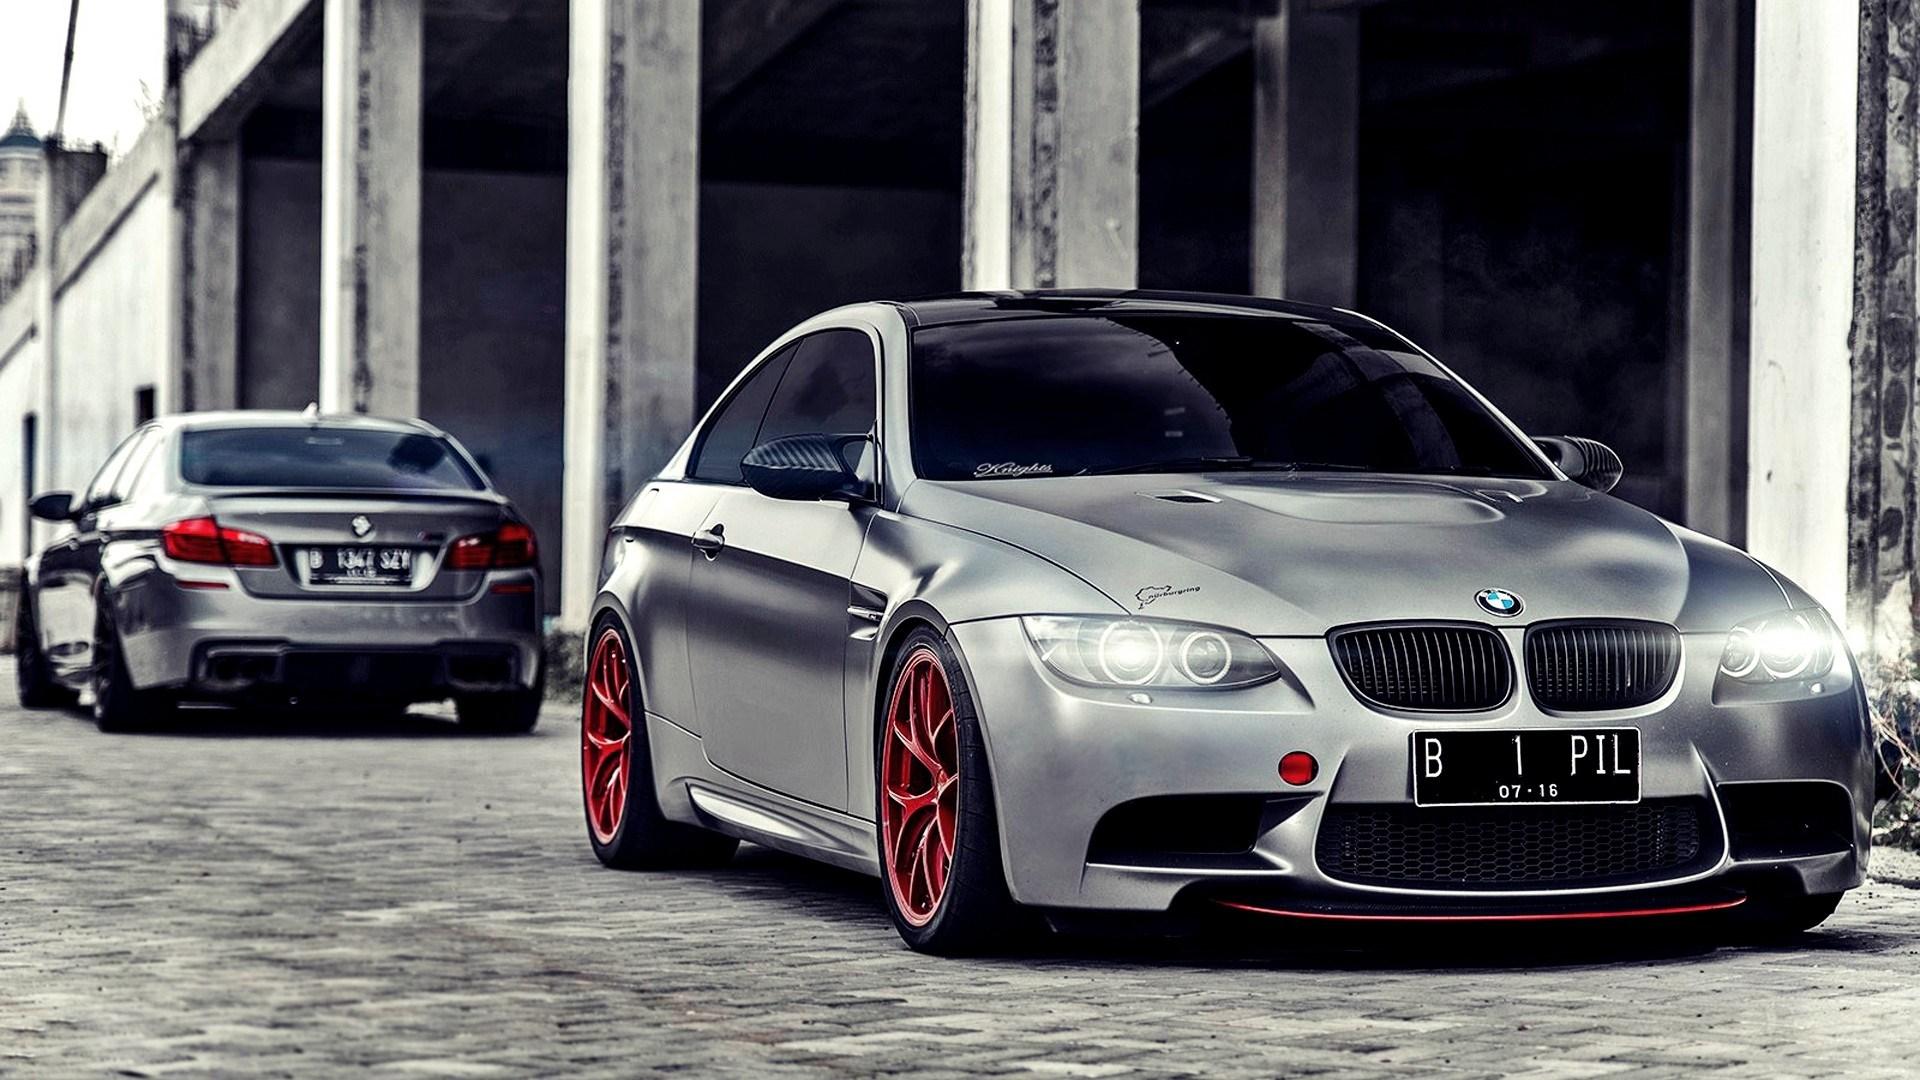 BMW M5 HD Wallpaper | Background Image | 1920x1080 | ID ...